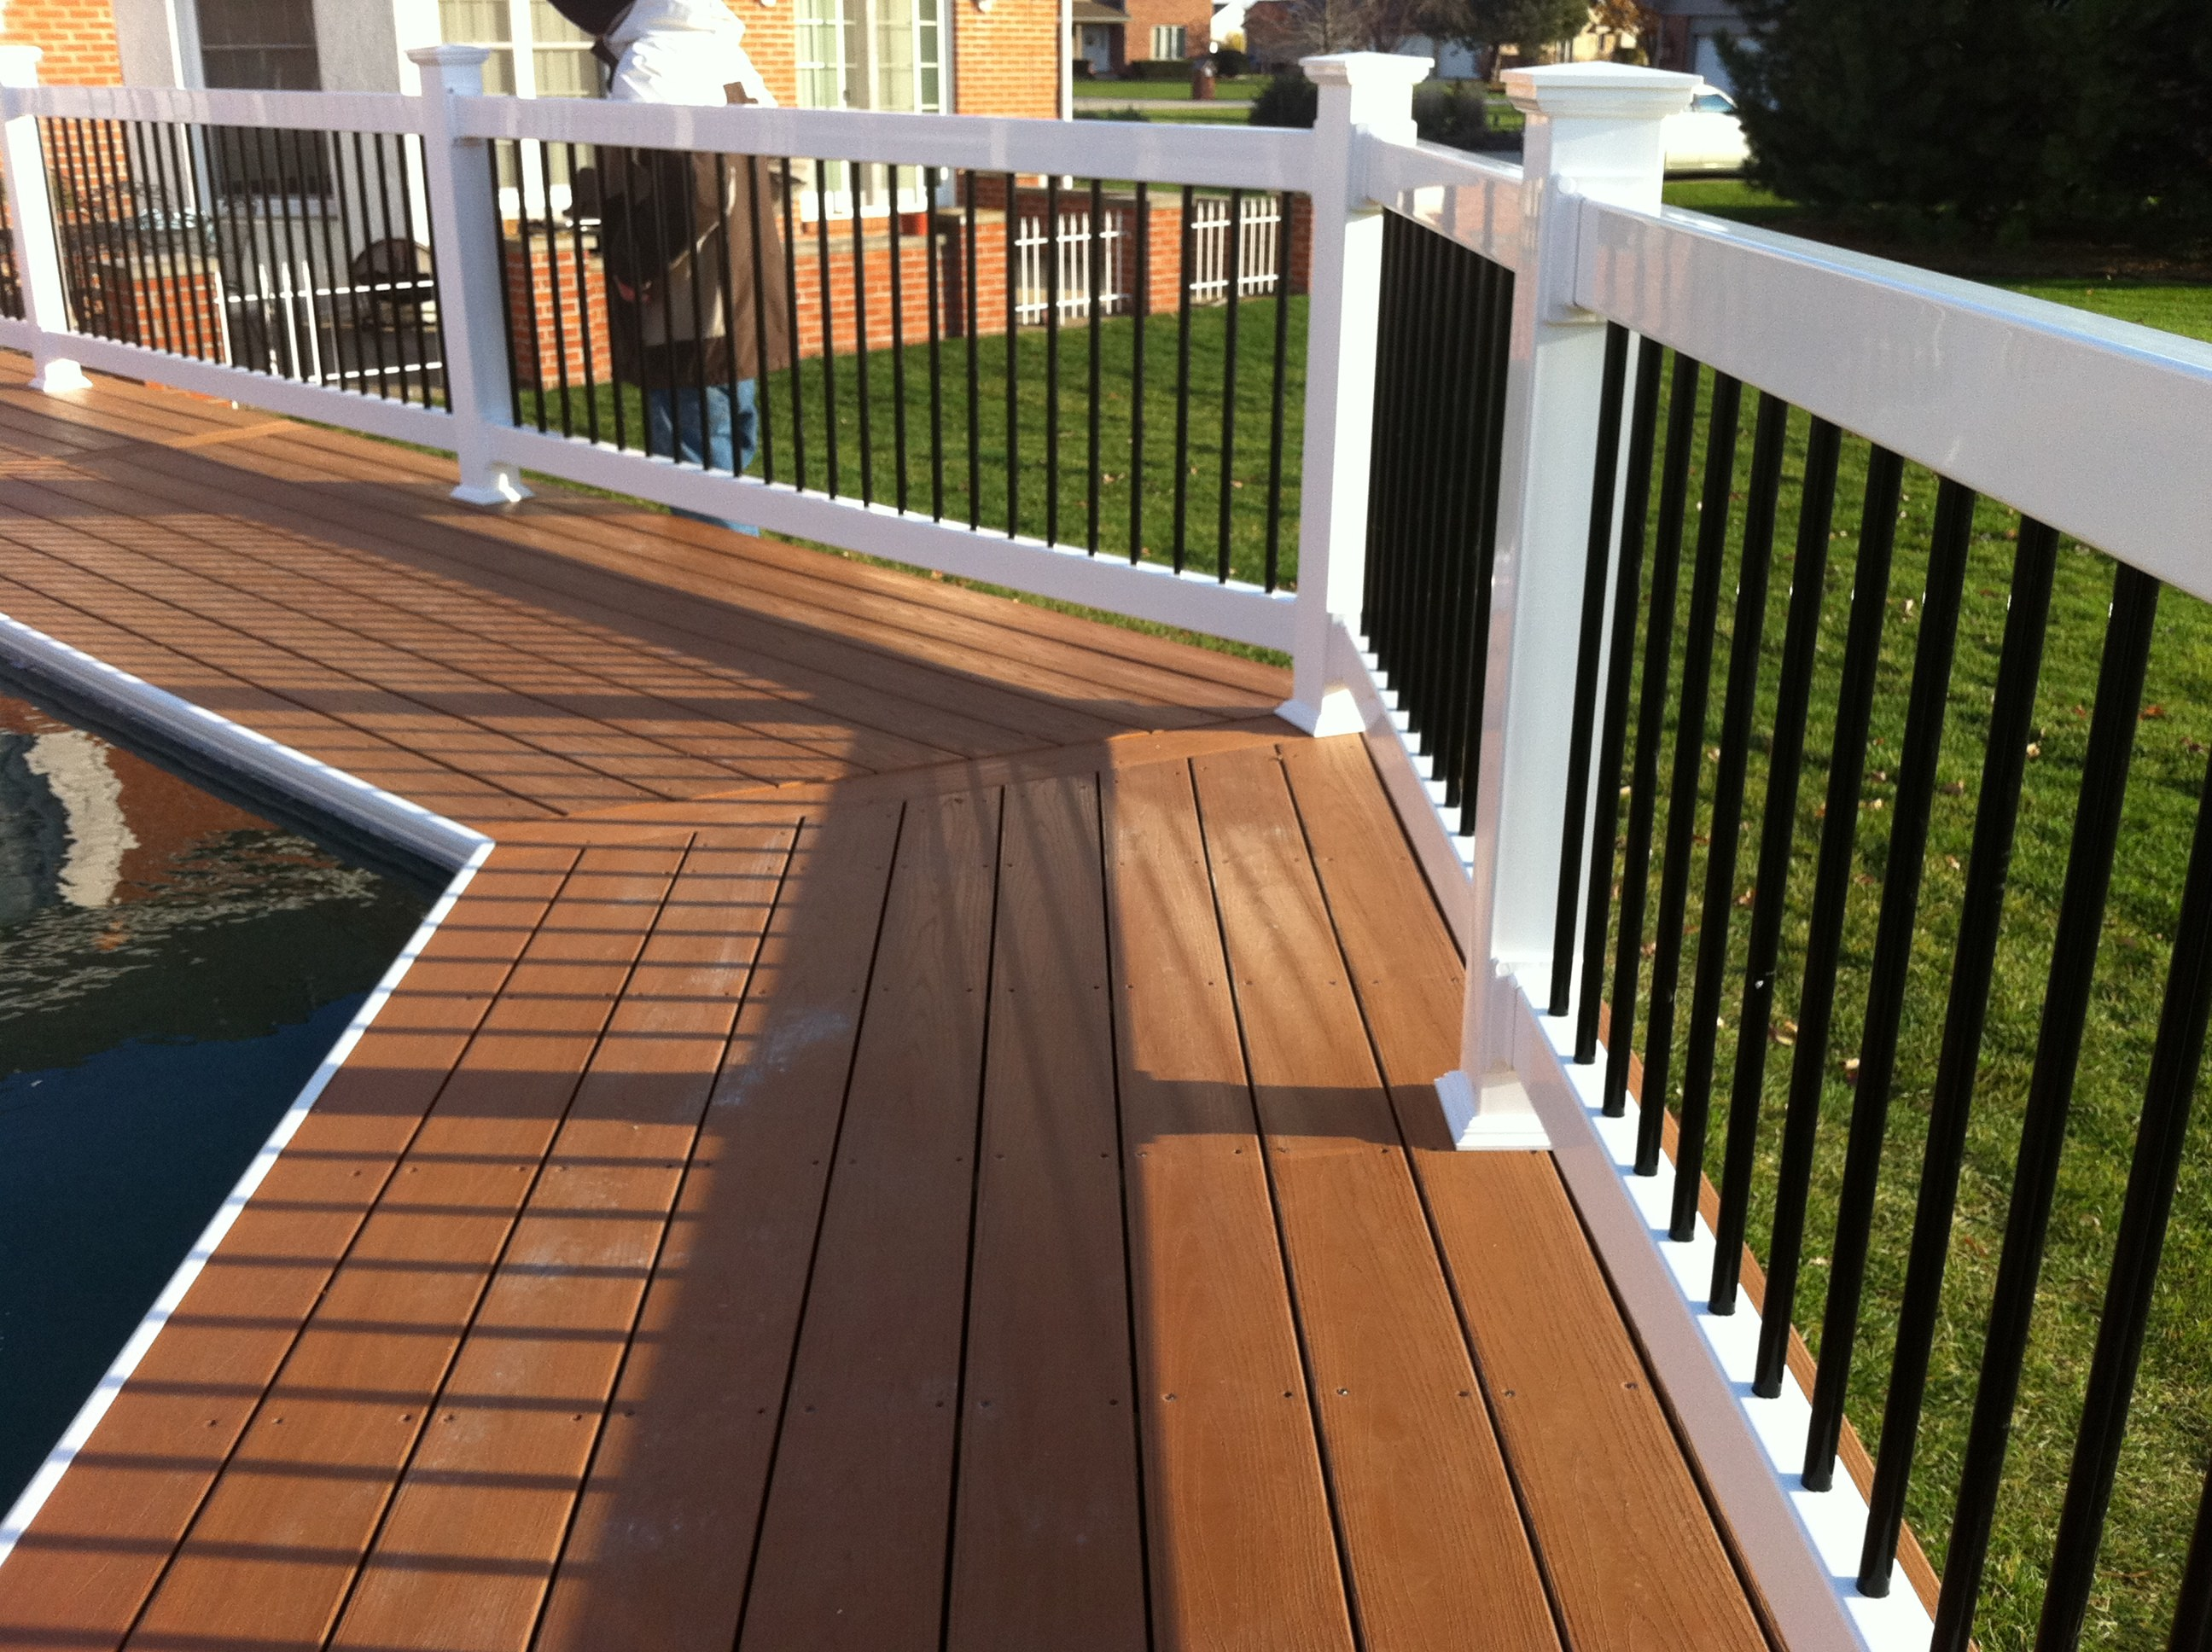 1000 images about decks on pinterest two tones decking. Black Bedroom Furniture Sets. Home Design Ideas